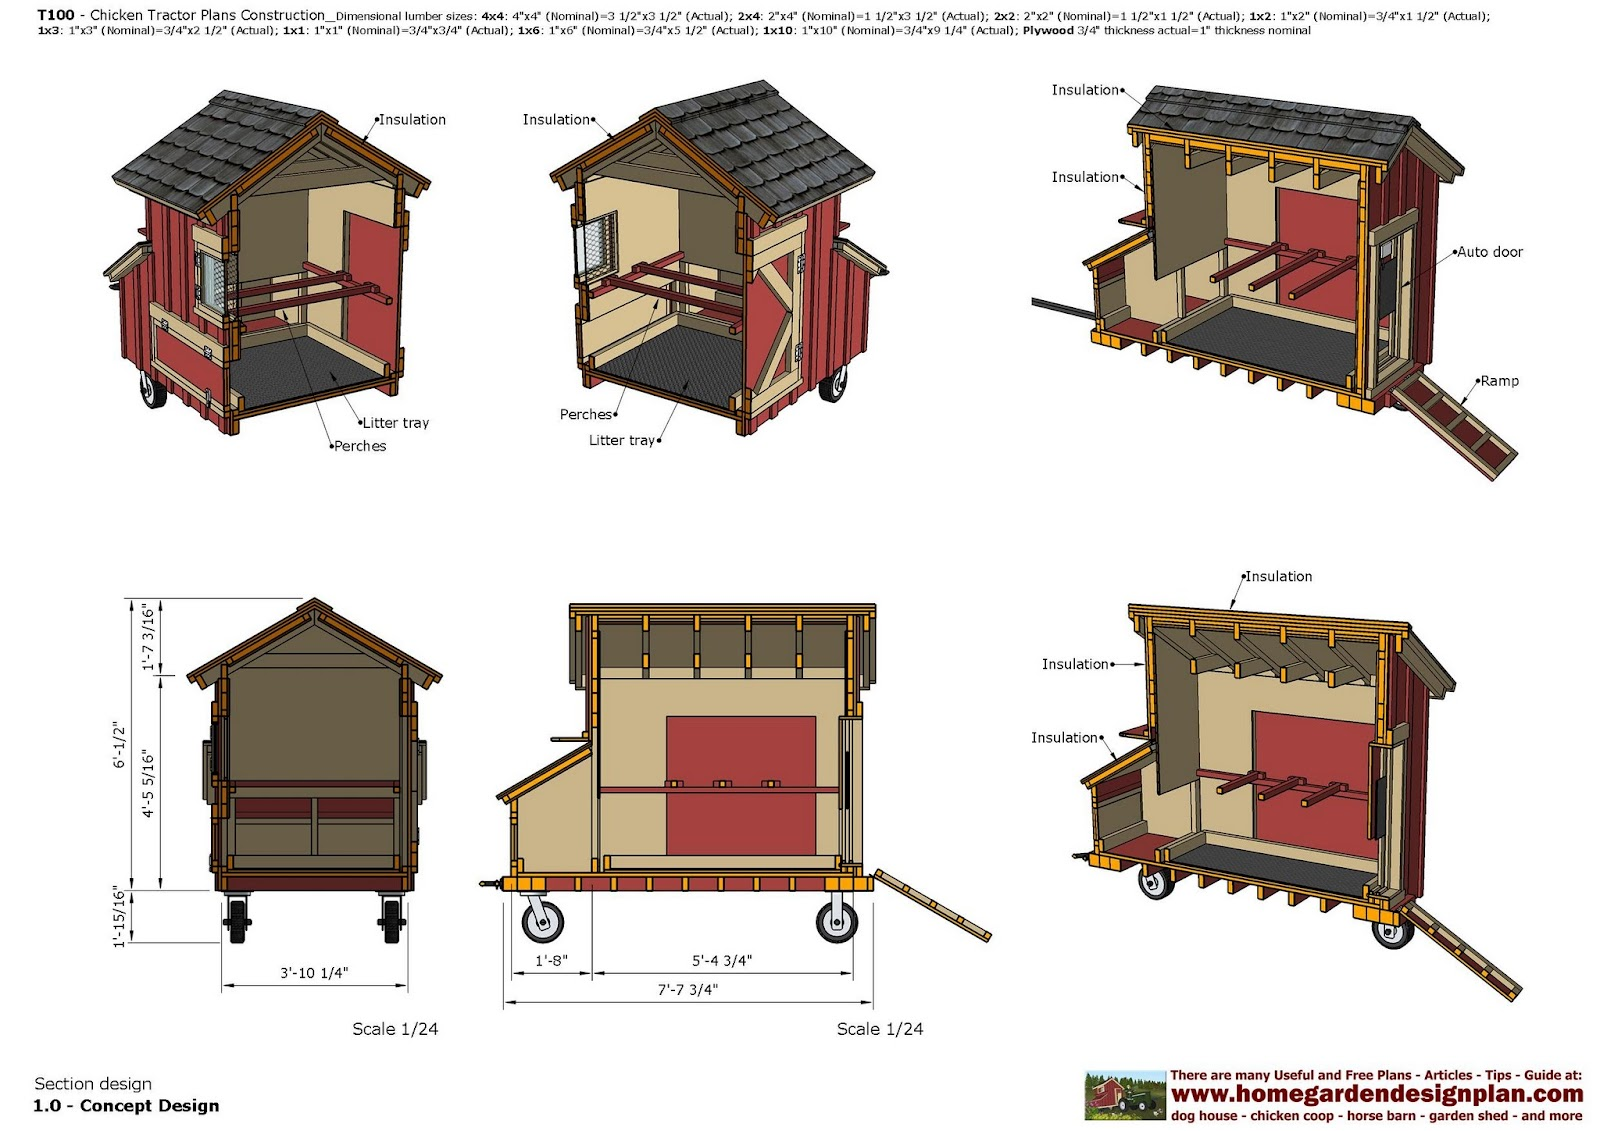 Home Garden Plans T100 Chicken Tractor Plans Chicken Trailer Plans Construction